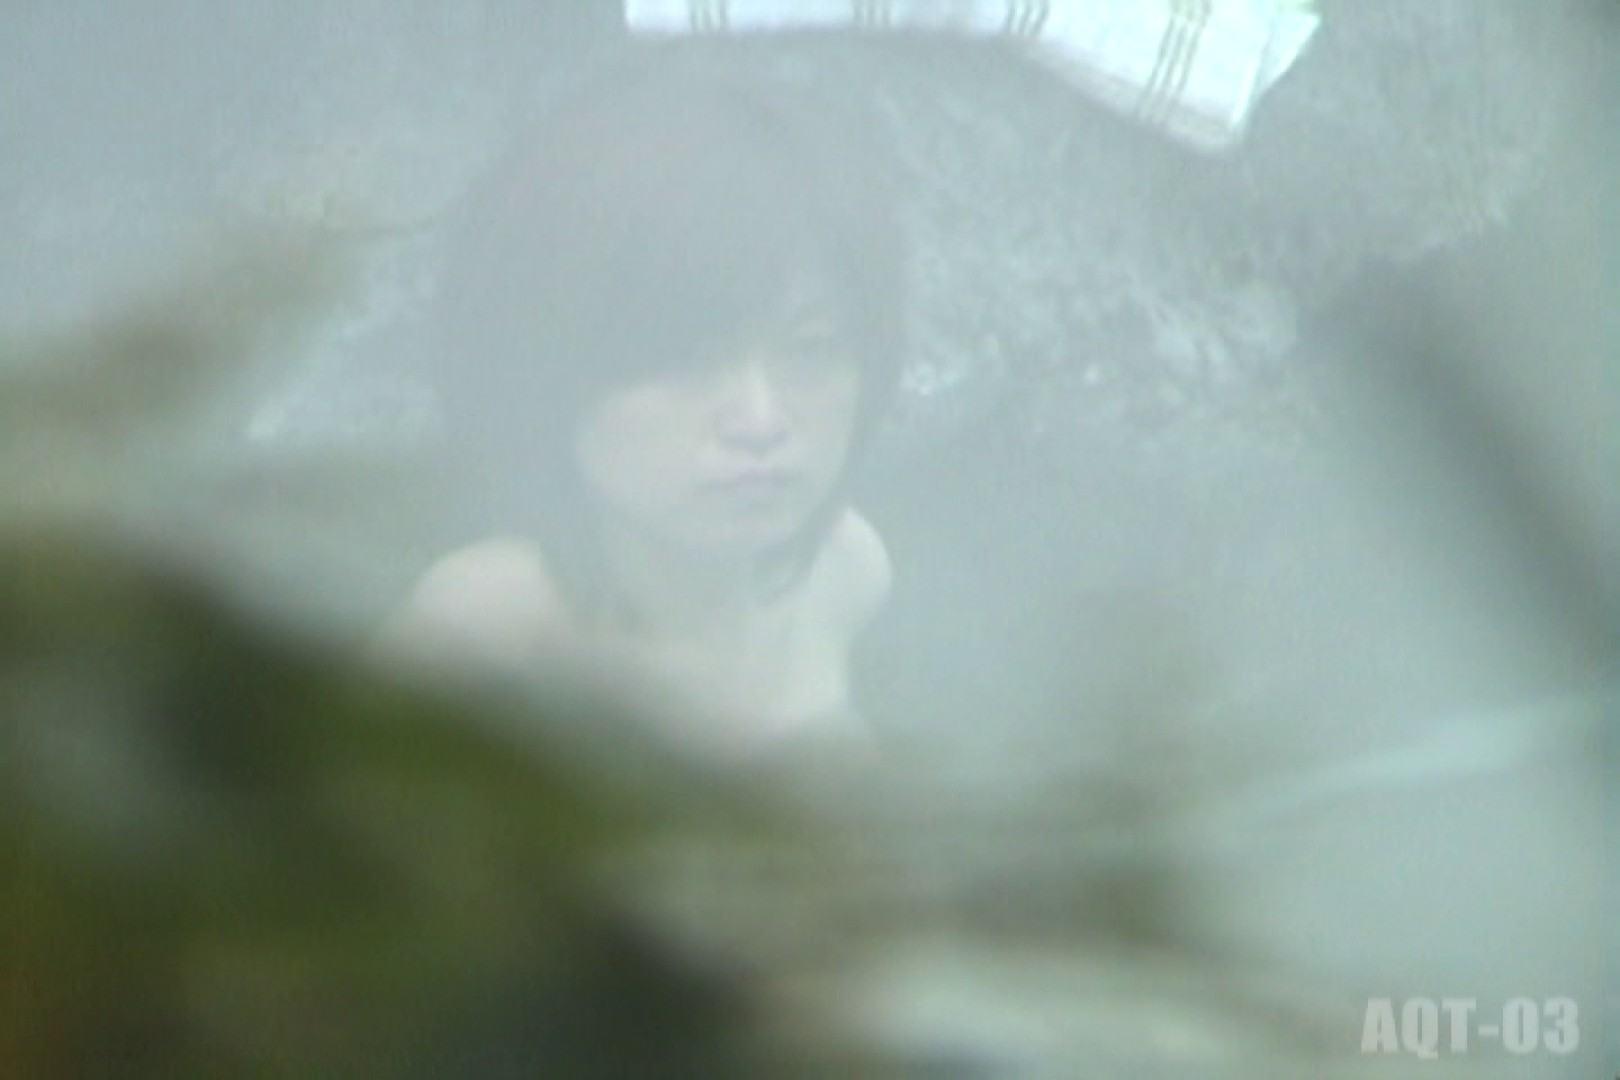 Aquaな露天風呂Vol.731 盗撮師作品  91pic 33